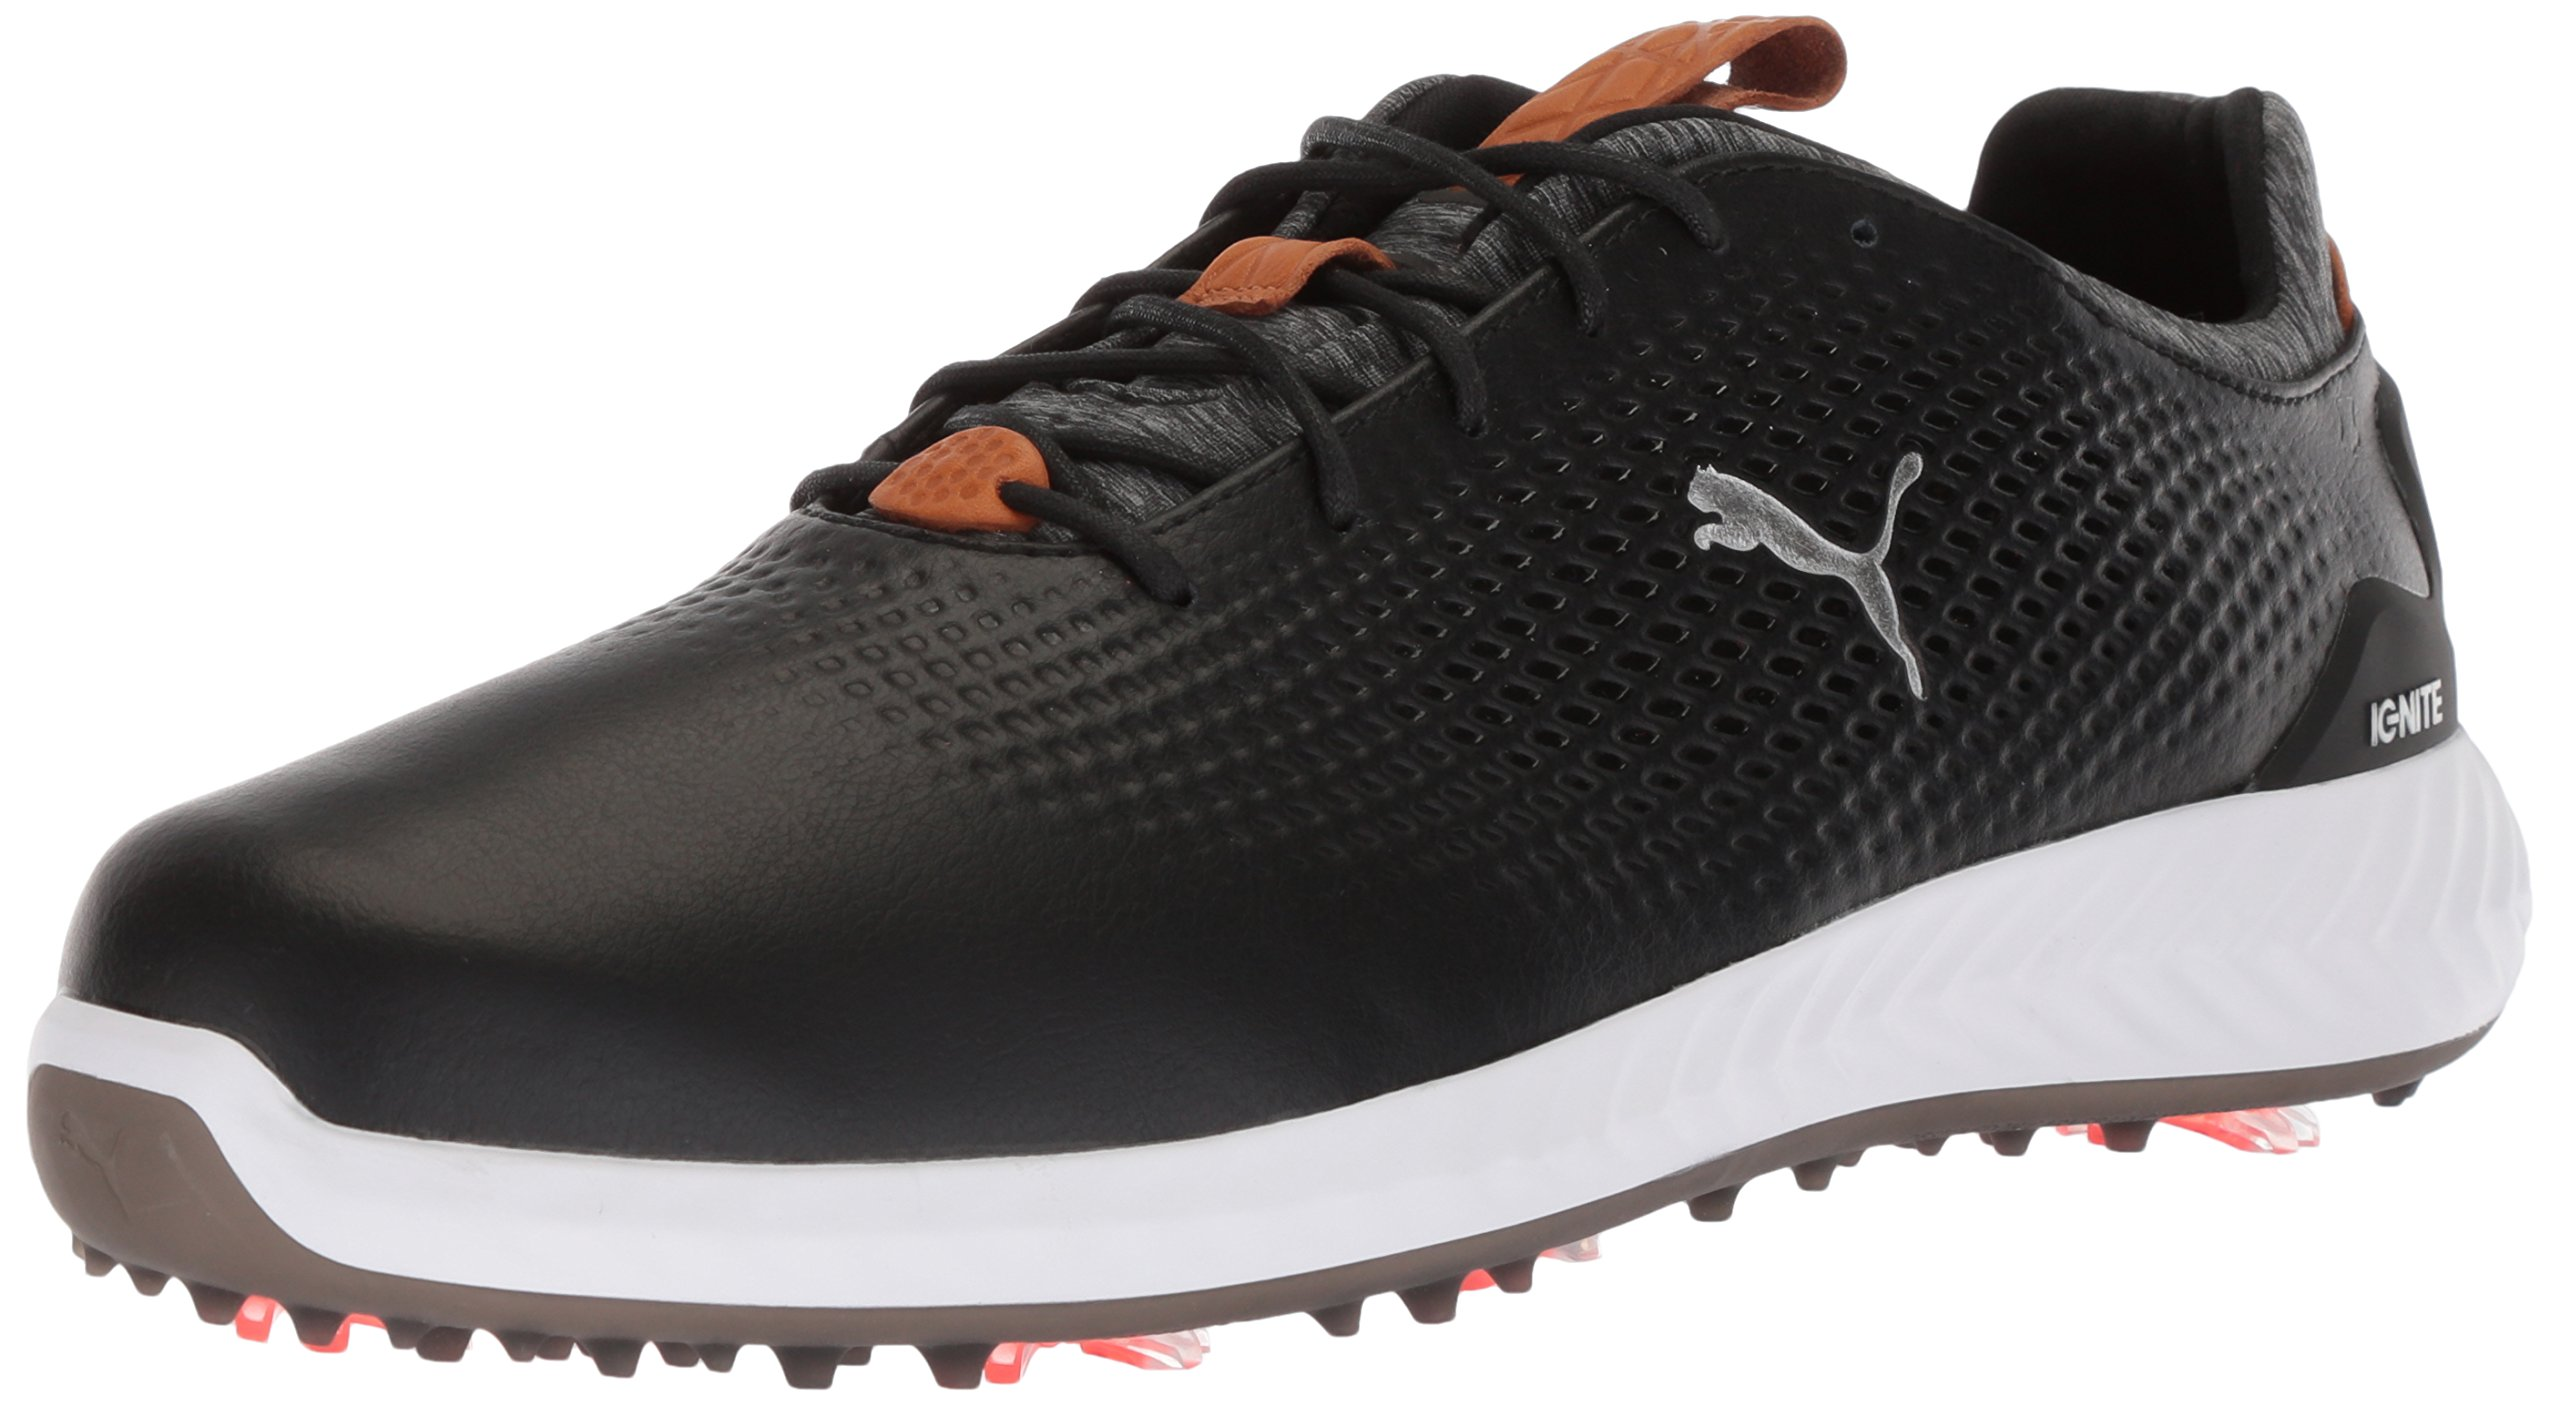 PUMA Golf Men's Ignite Pwradapt Leather Golf Shoe, Black/Black, 11 Medium US